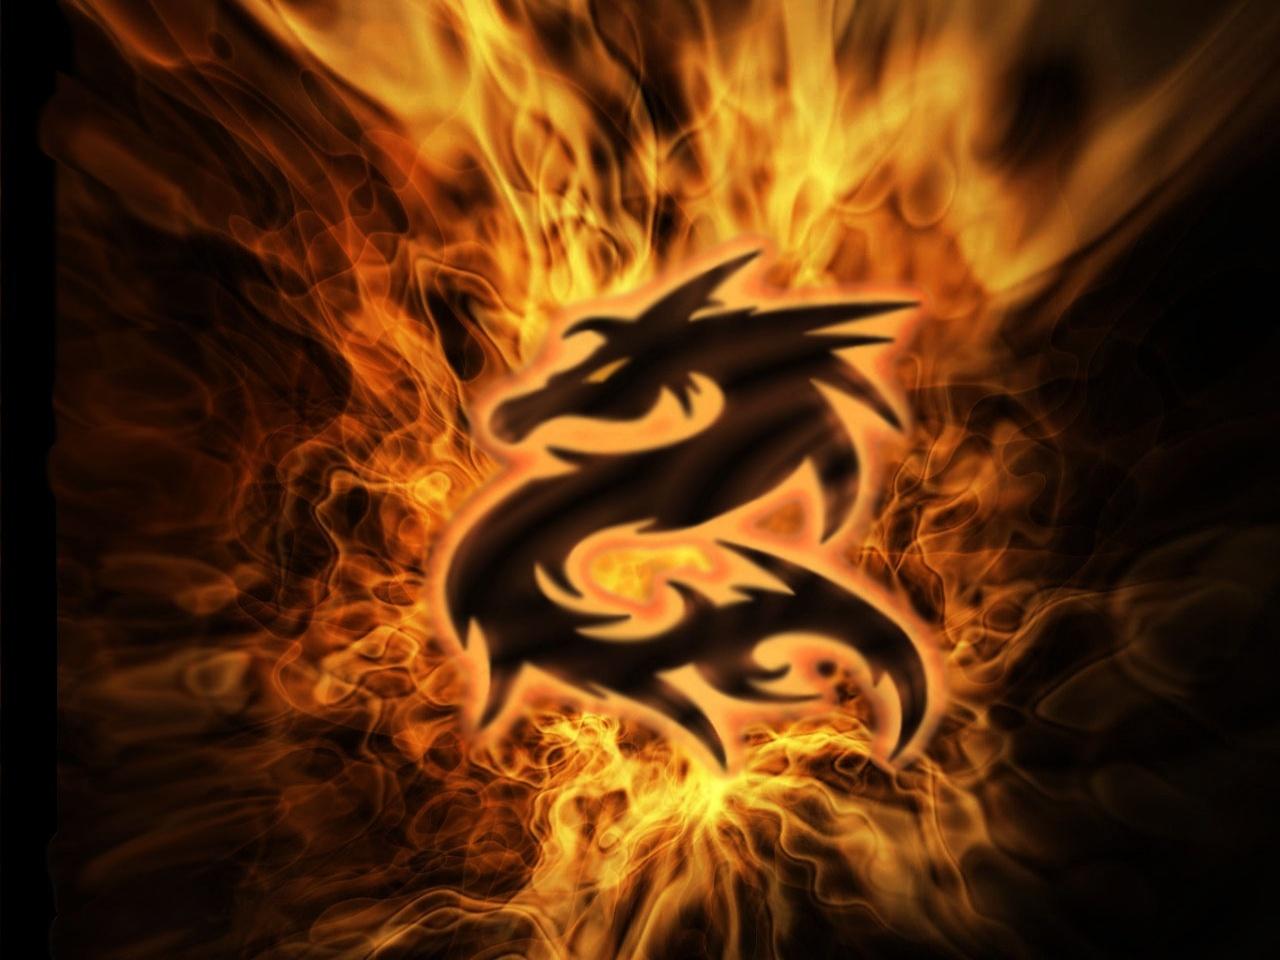 Flaming Dragon Wallpaper pegasusknight 1280x960